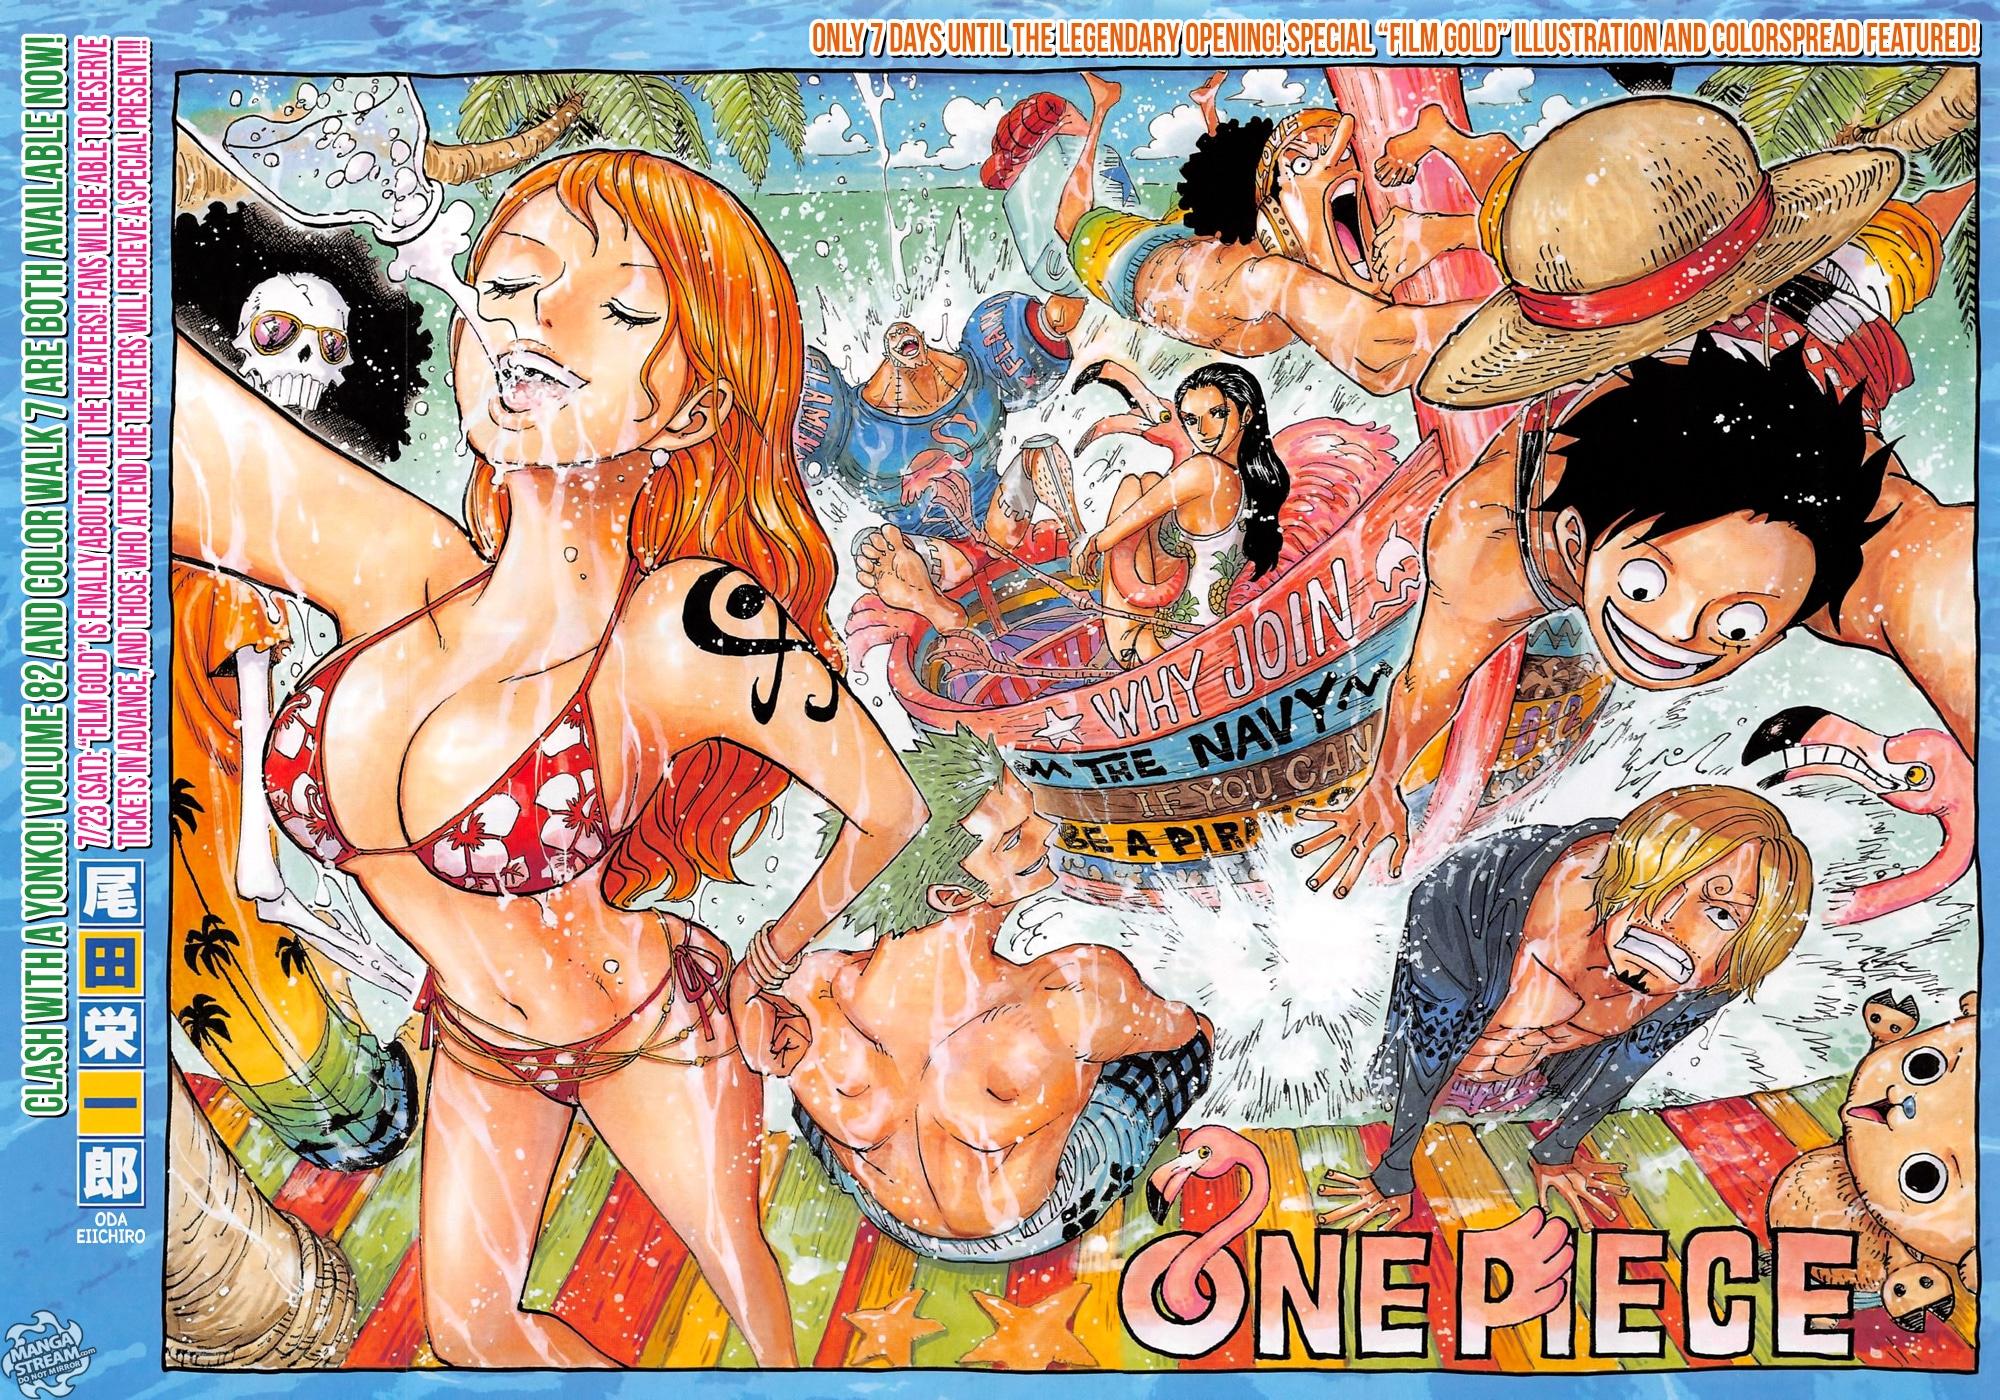 One Piece Chapter 832: Vương quốc Germa Image